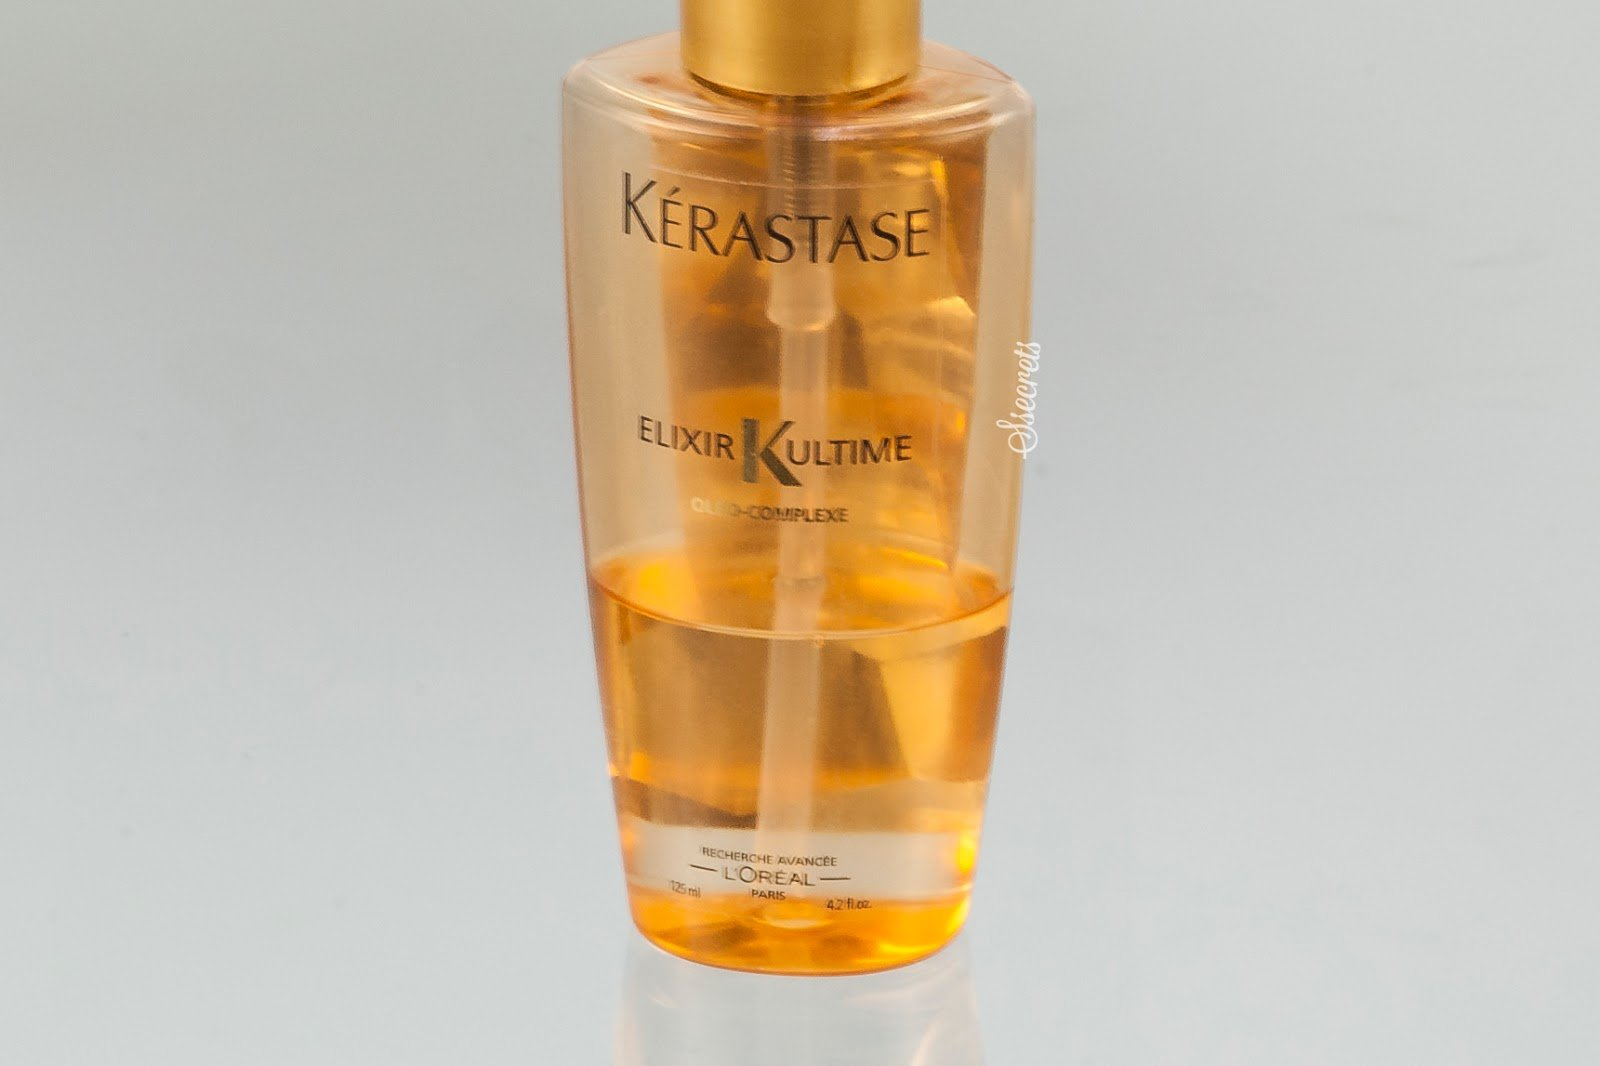 elixir k ultimate aceite de kerastase